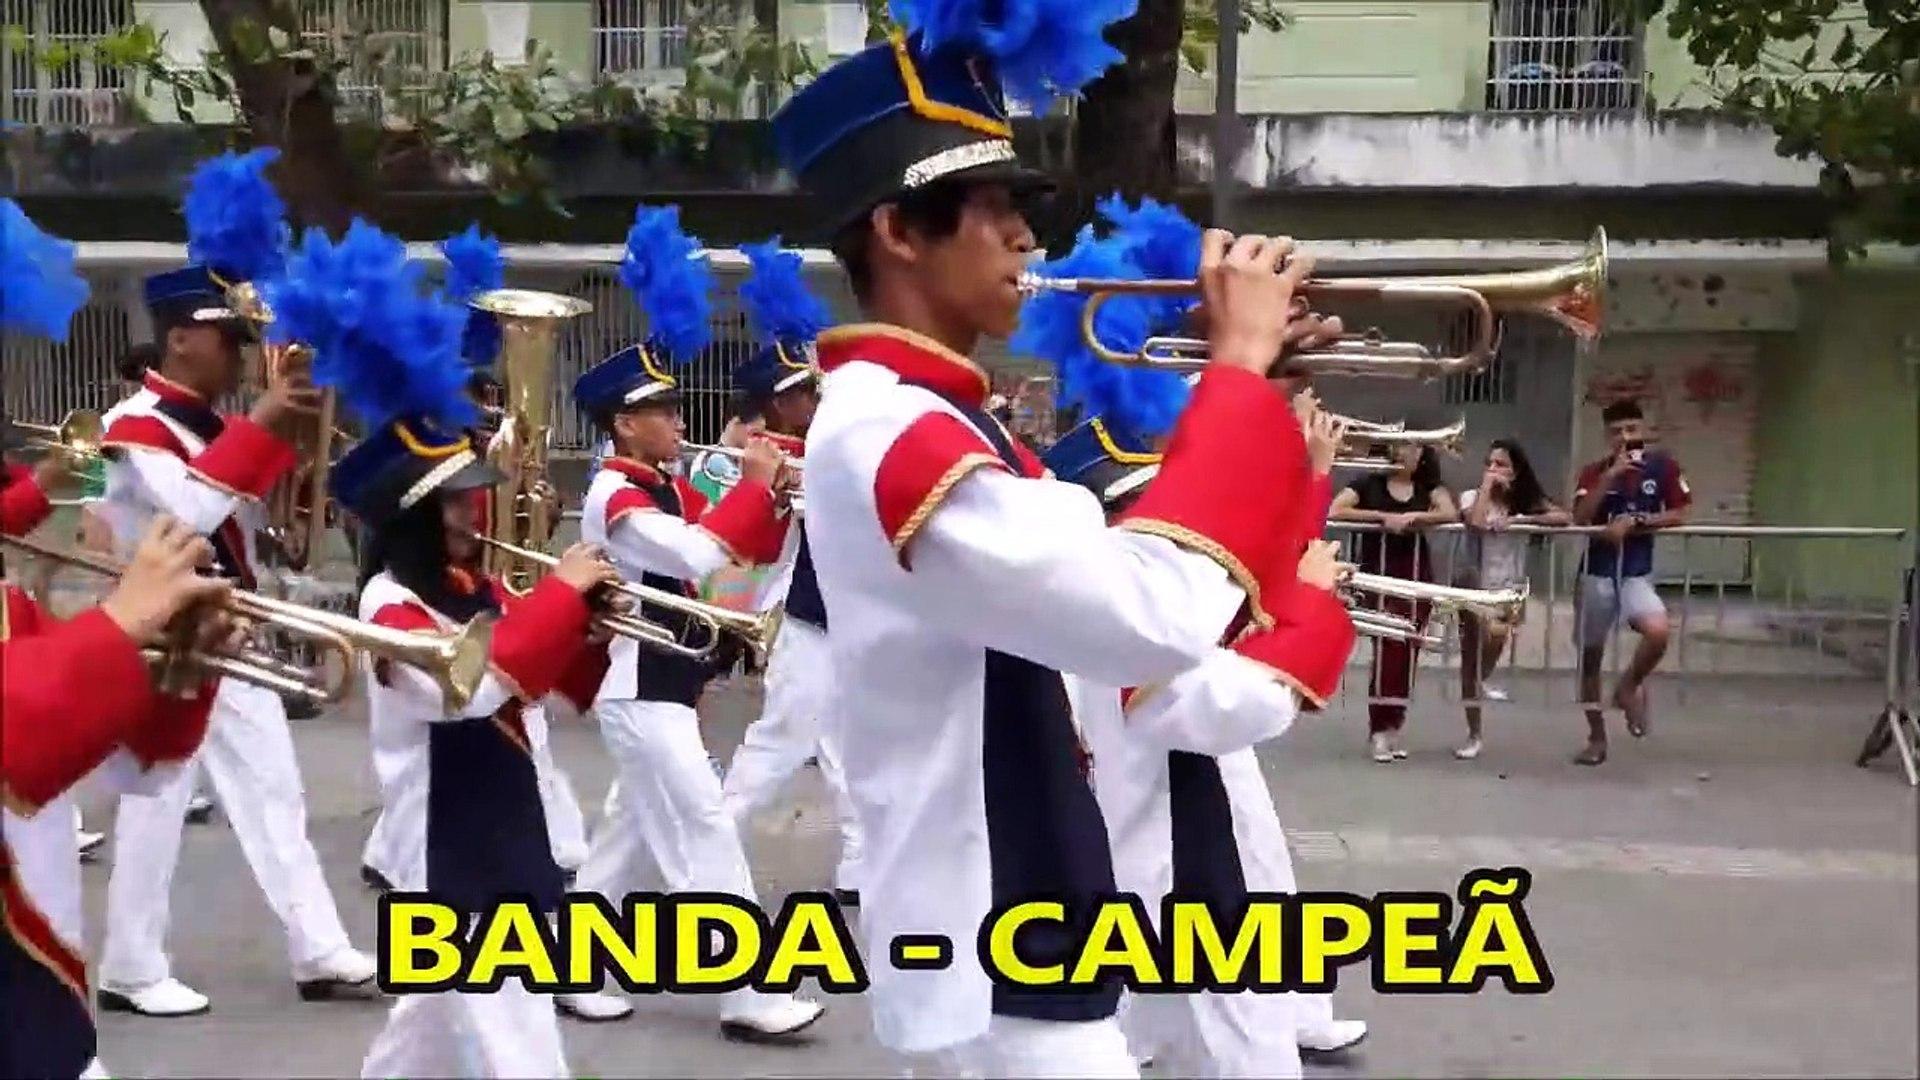 CNBF - 2018 _ Banda Marcial Profa Maria Bronzeado Machado _ CAMPEONATO NACIONAL DE BANDAS E FANFARRA